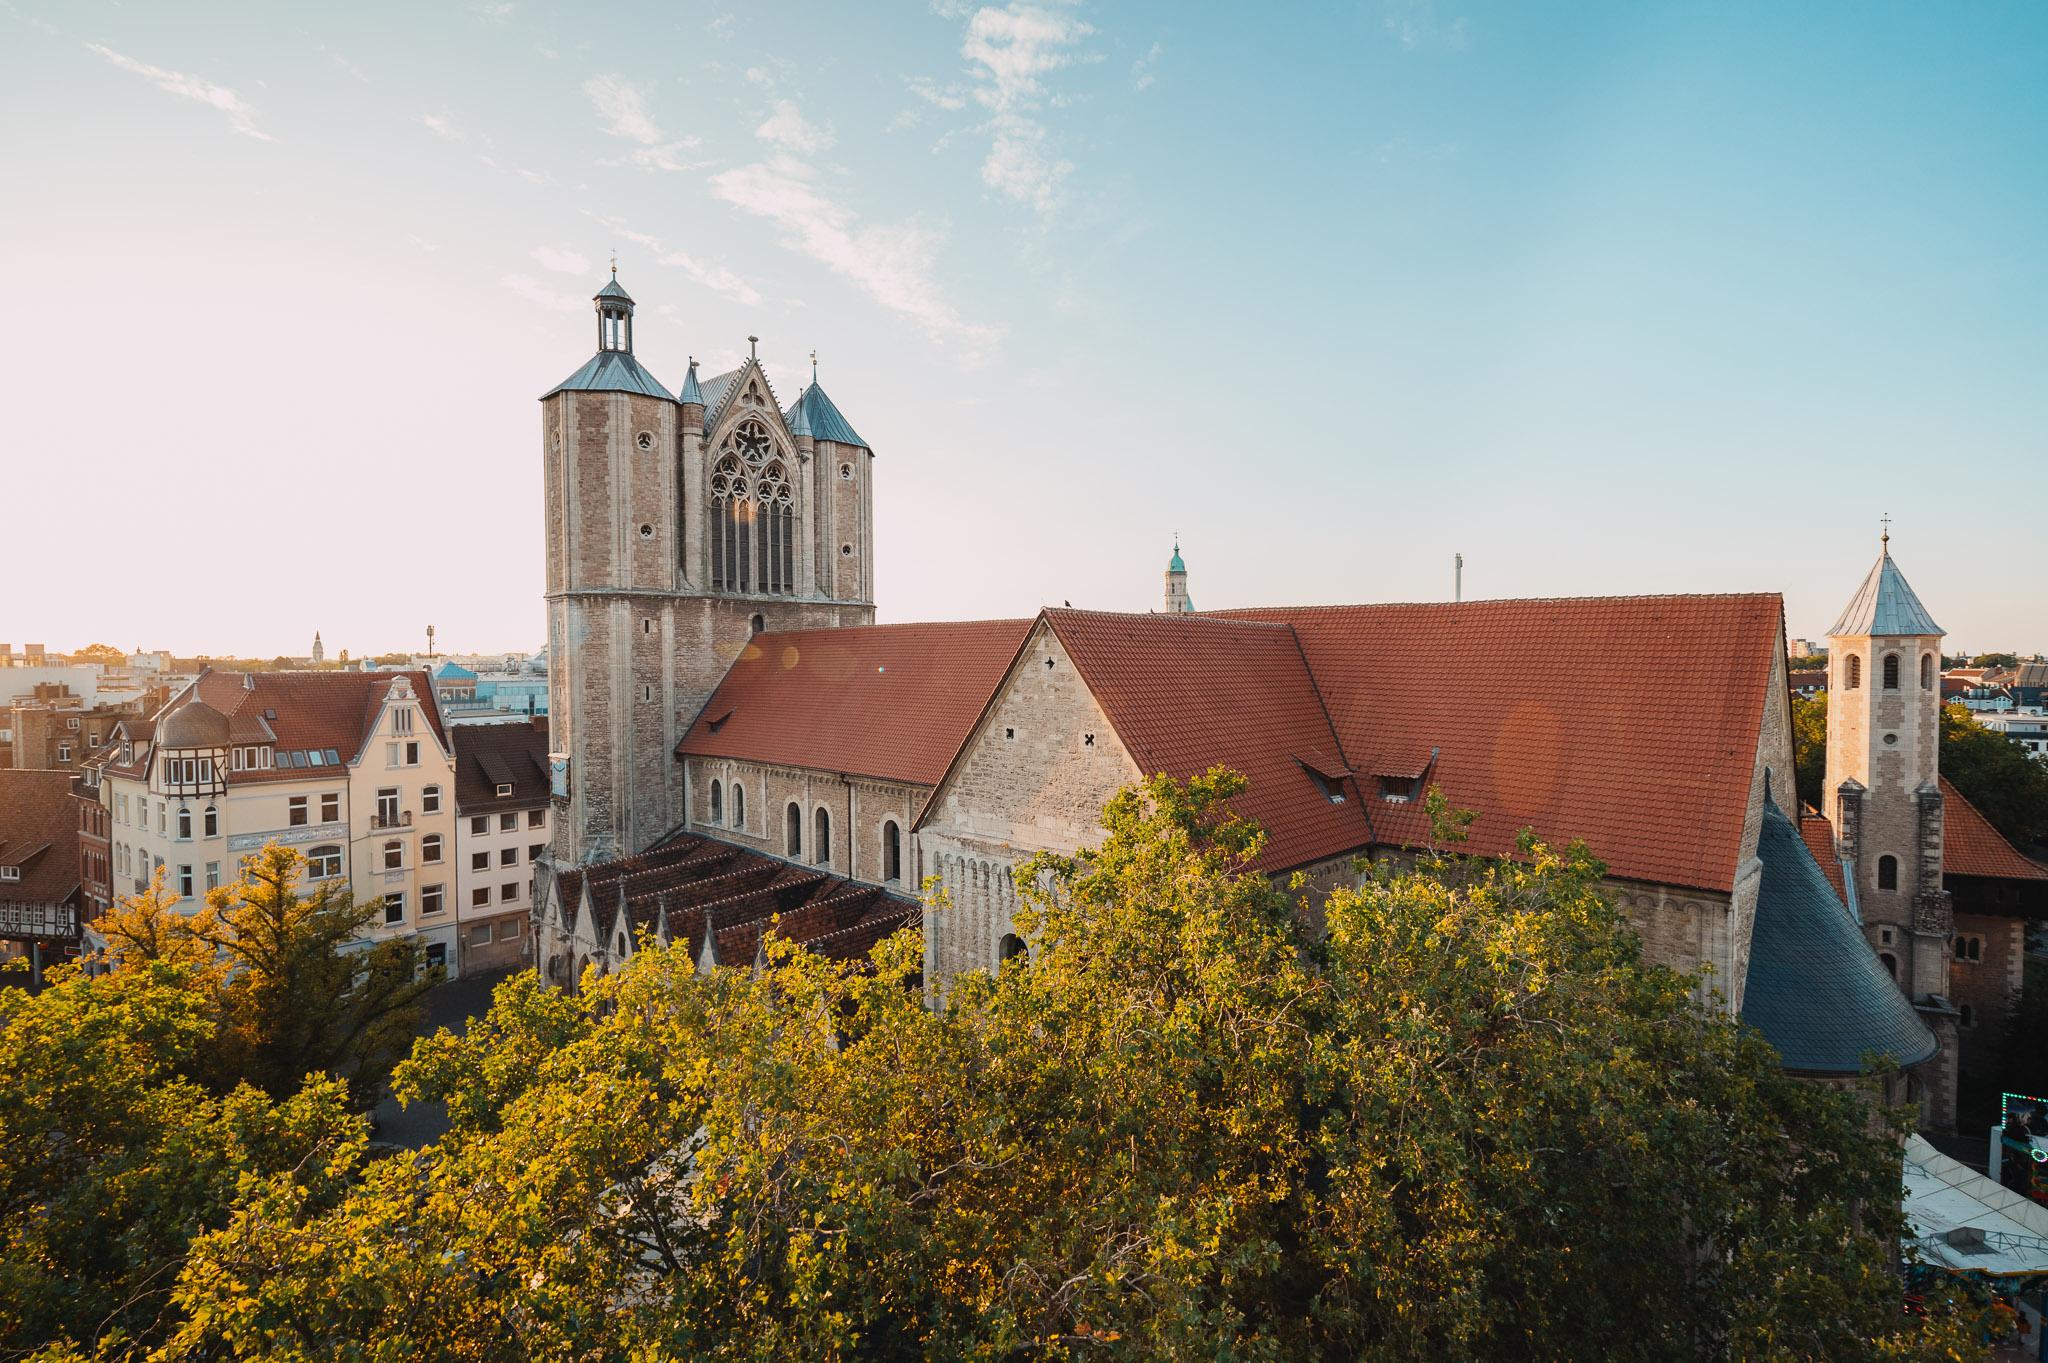 Braunschweiger Dom, Germany